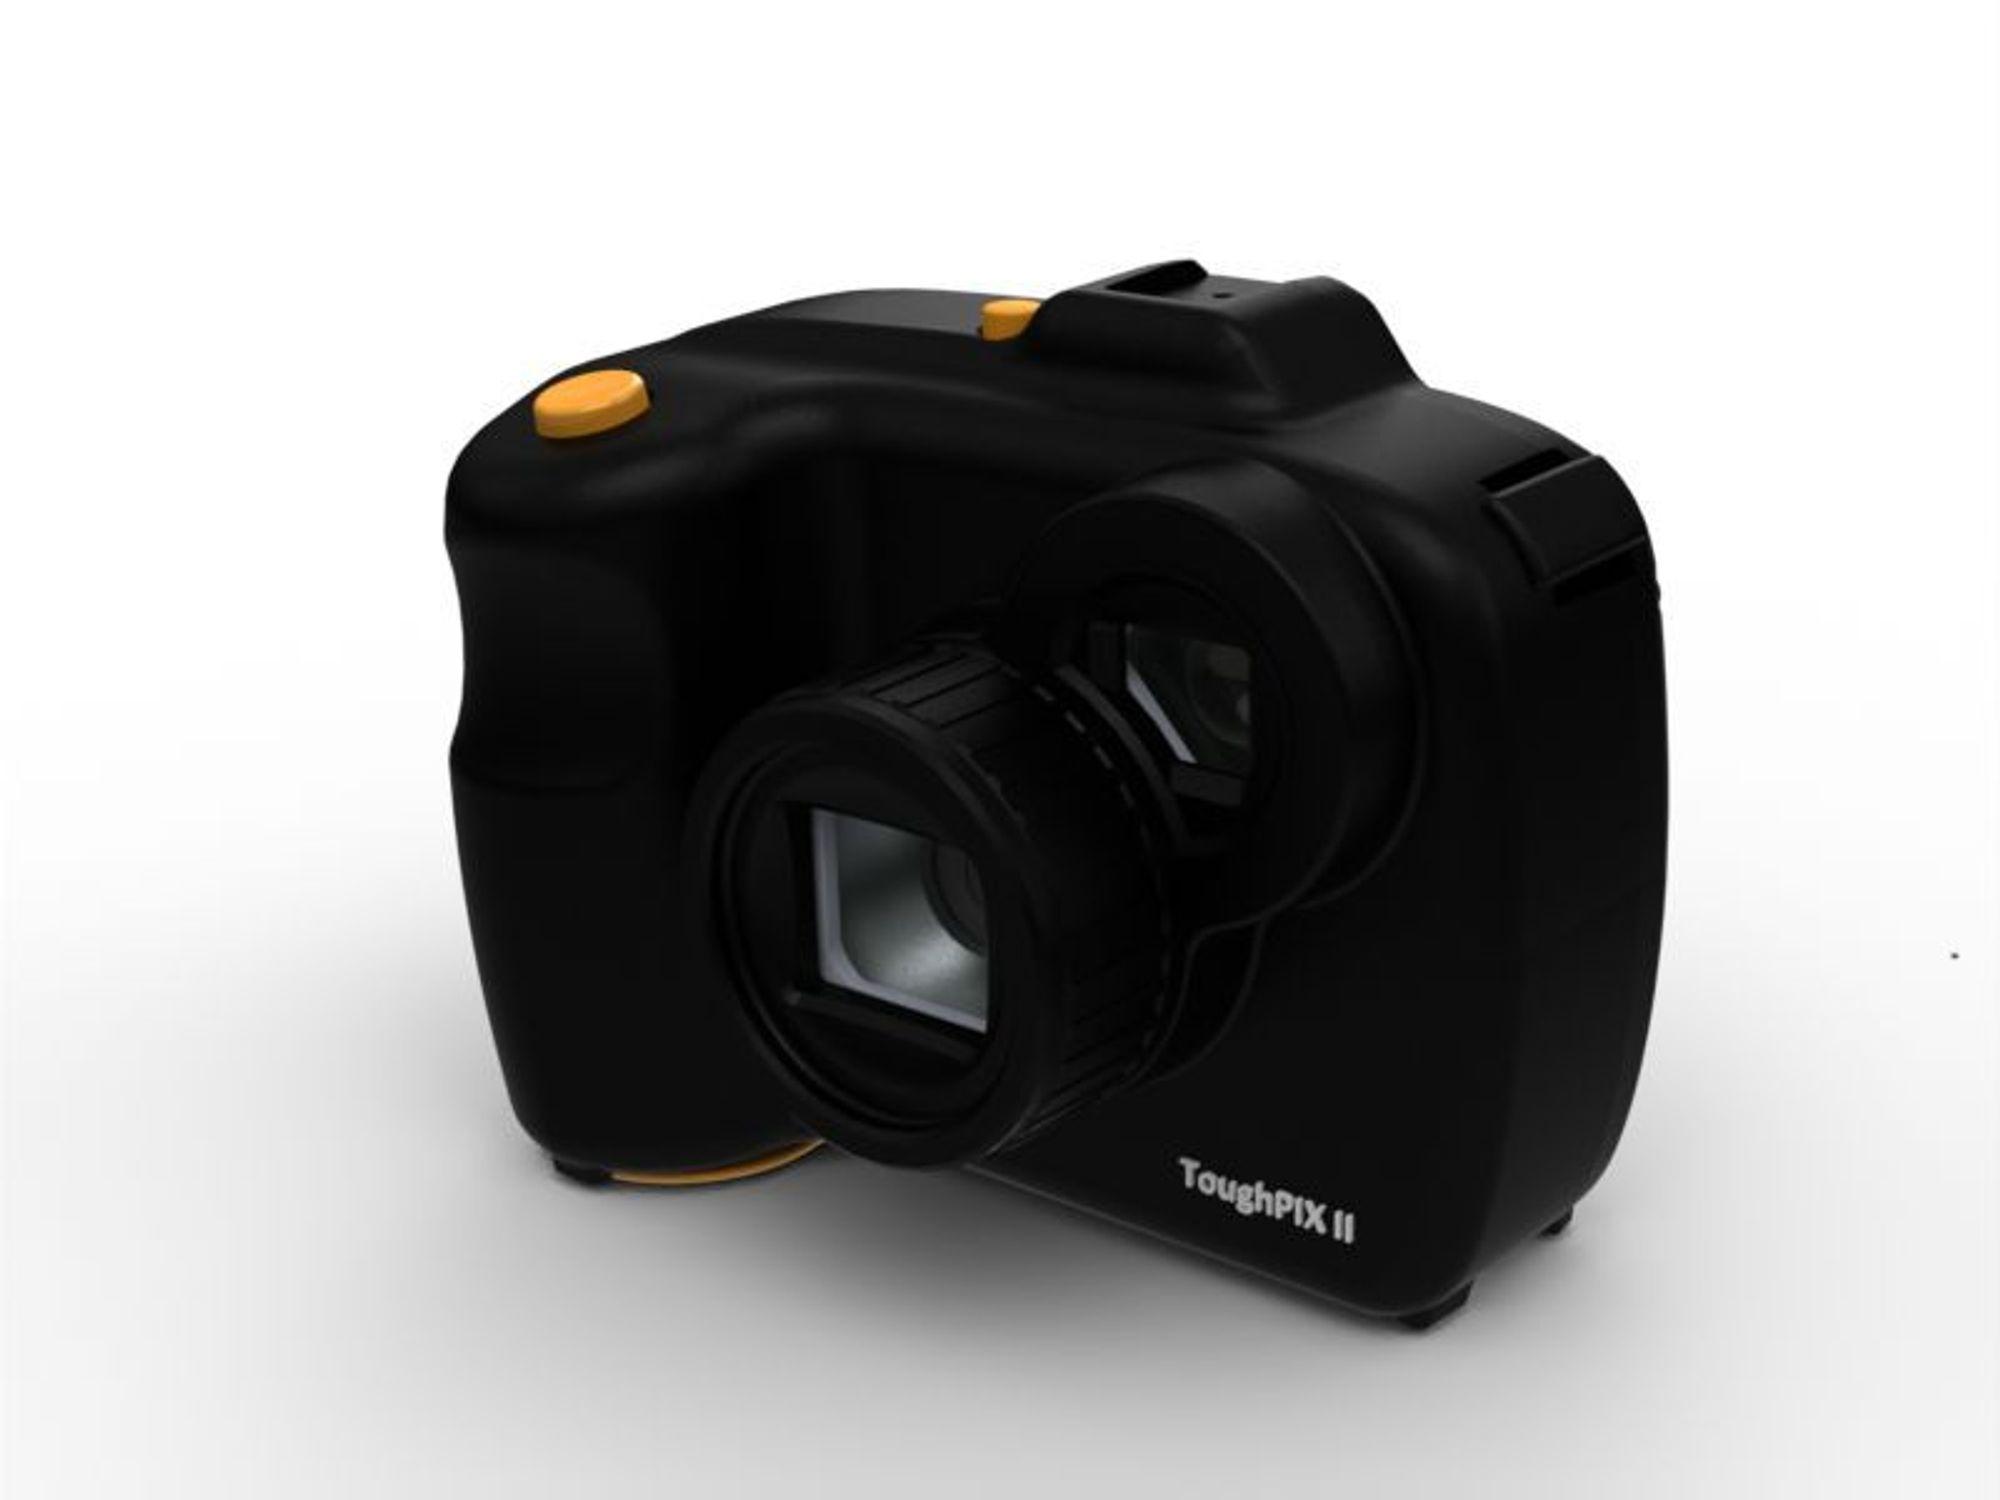 Ex-kamera med oppløsning på 16 megapiksel, 16 GB minne, 3x optisk zoom.